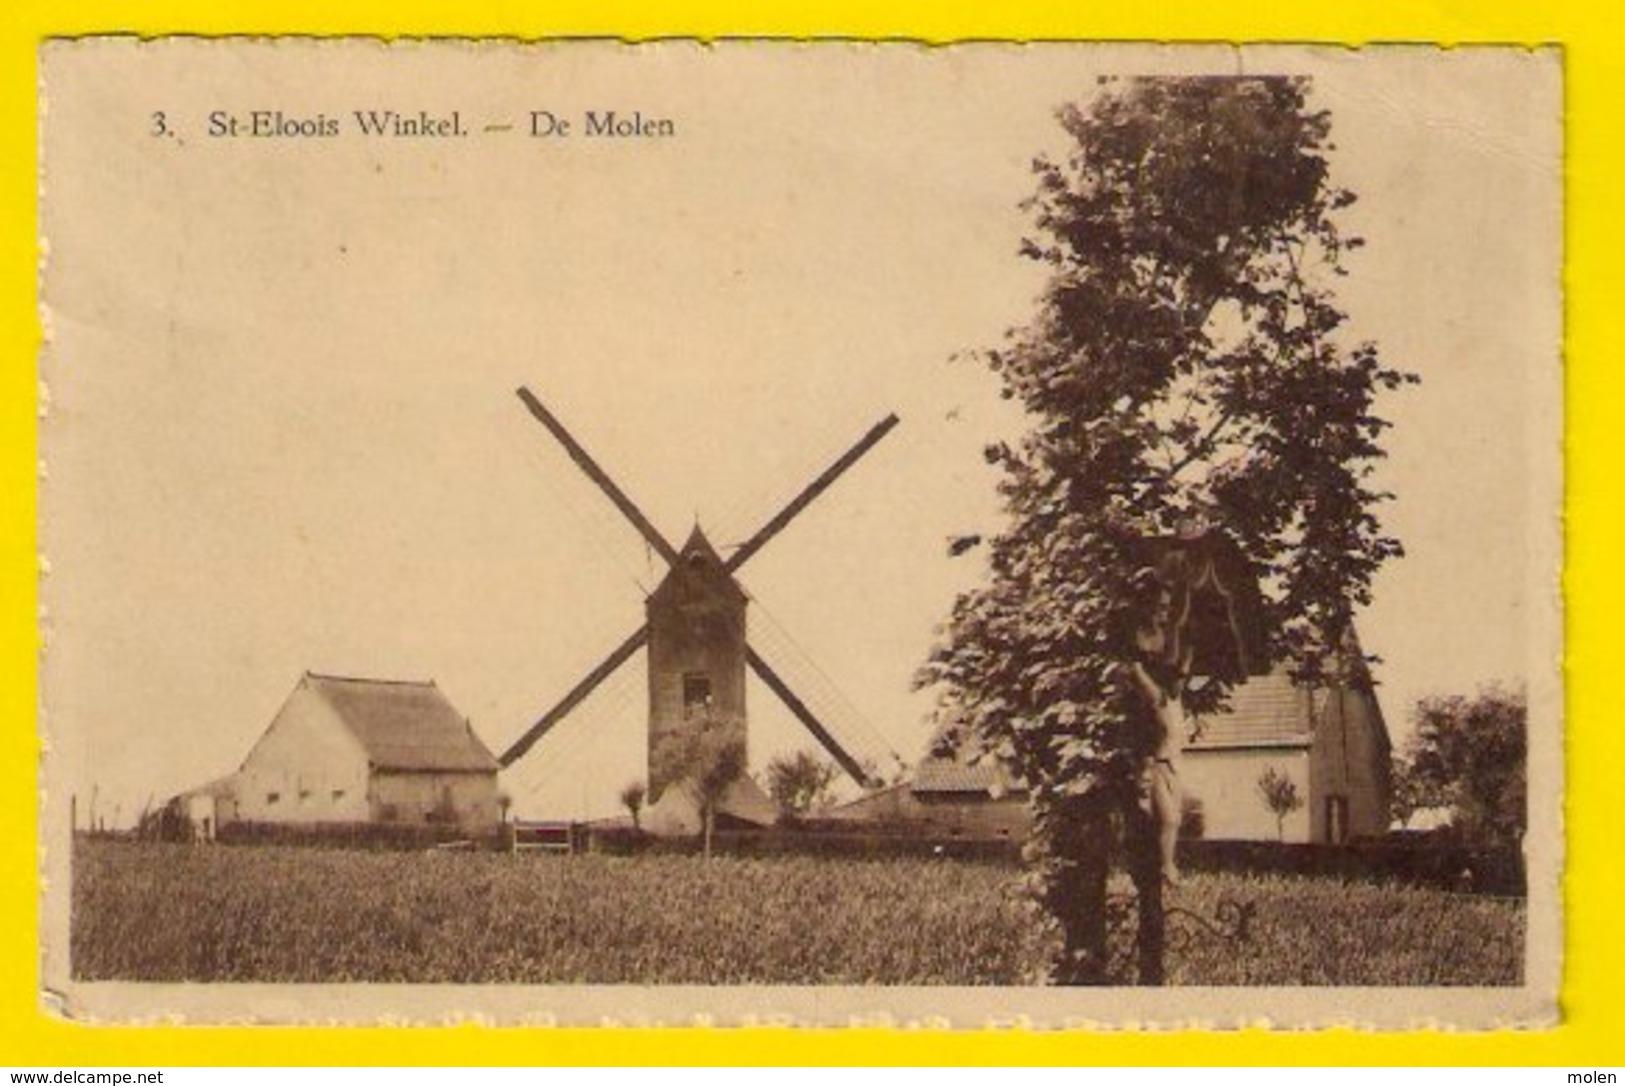 ST-ELOOIS WINKEL 1914 * DE MOLEN * Uitg J Oost-Vanhevel * SINT-ELOOIS-WINKEL LEDEGEM * MOULIN Heemkunde 3046 - Ledegem